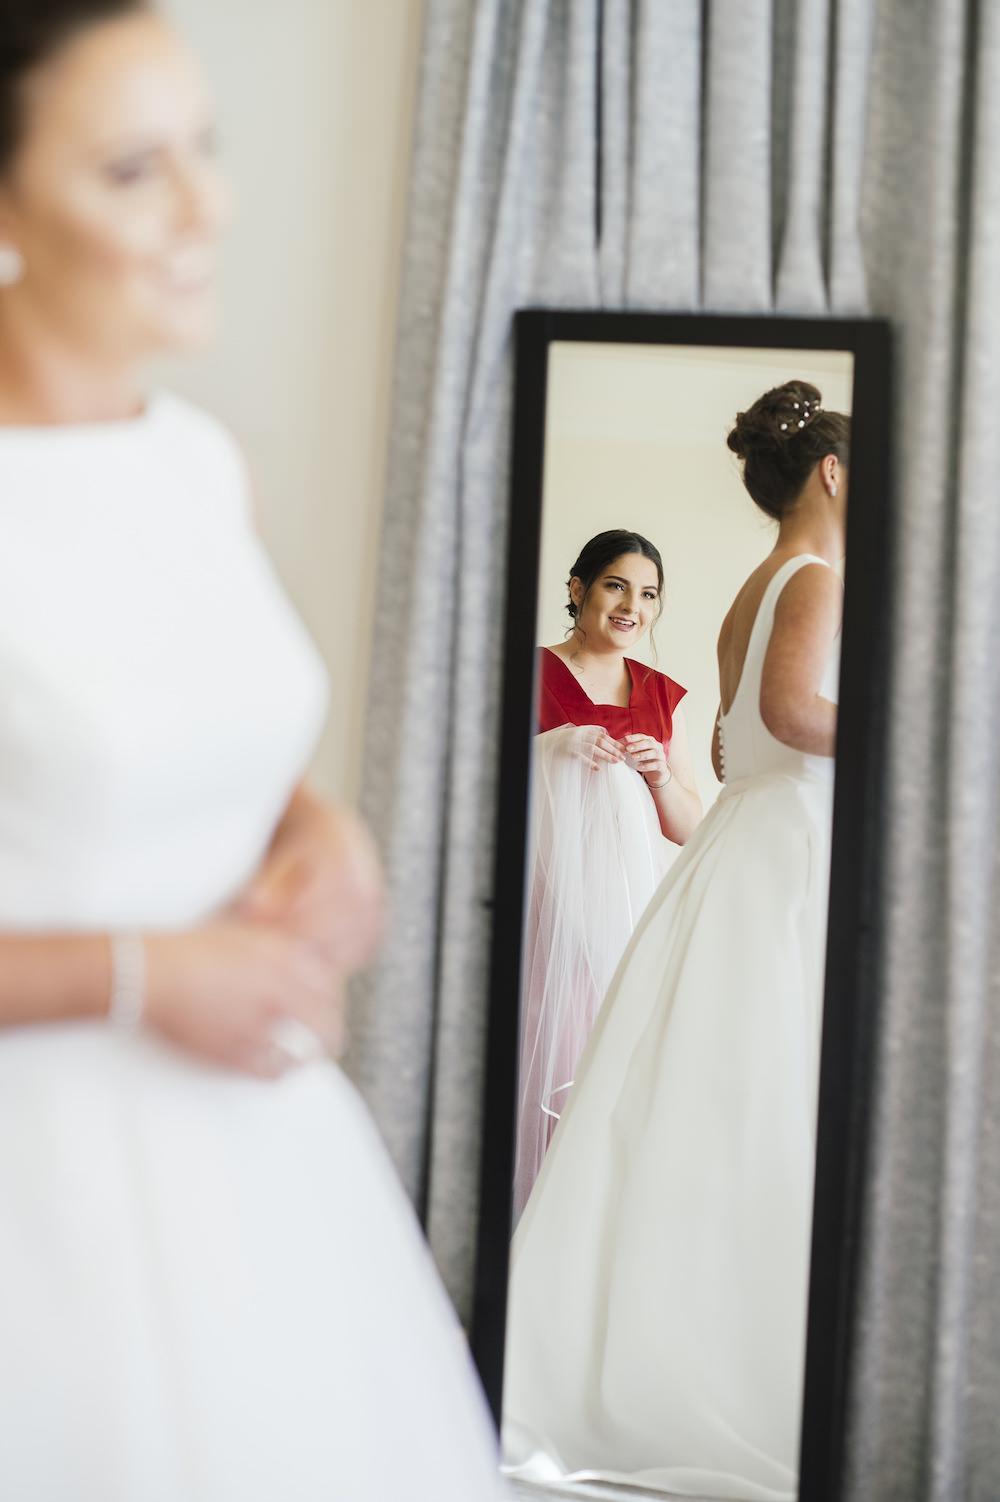 lindahamish-wedding-107.JPG